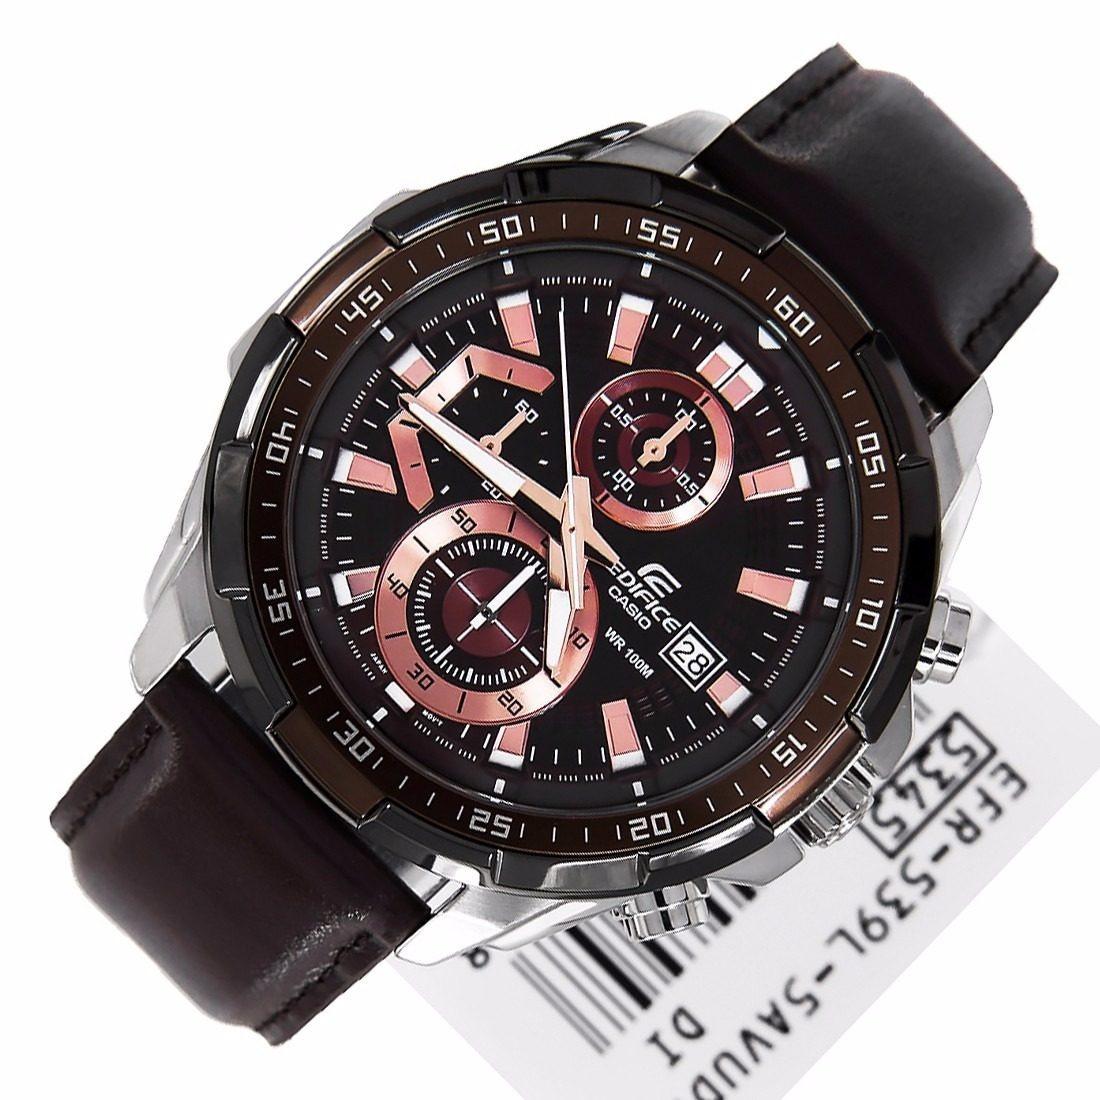 82cbfa46368f reloj casio edifice efr-539l-5av correa cuero - 100% nuevo. Cargando zoom.